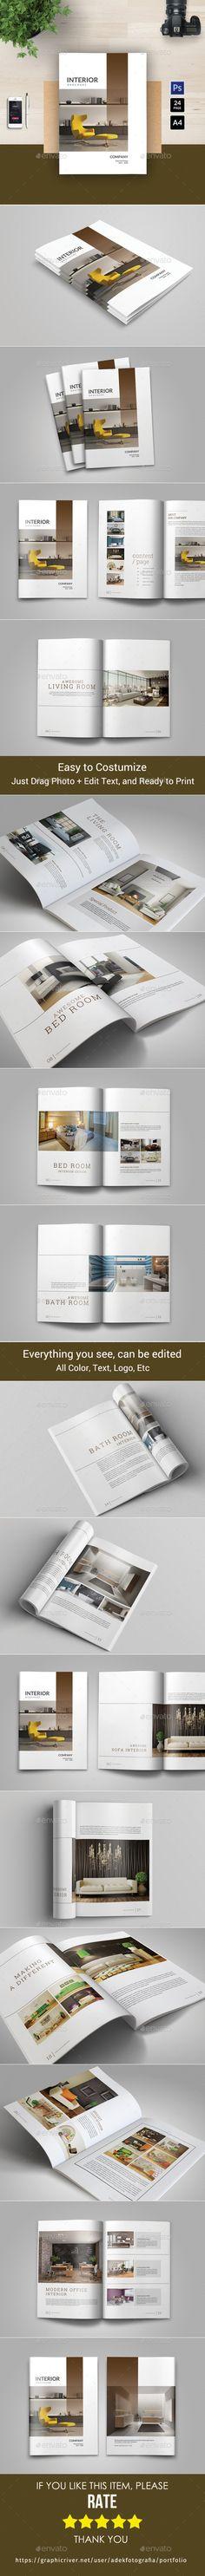 Minimal Architecture Brochure Templates Minimal architecture - architecture brochure template